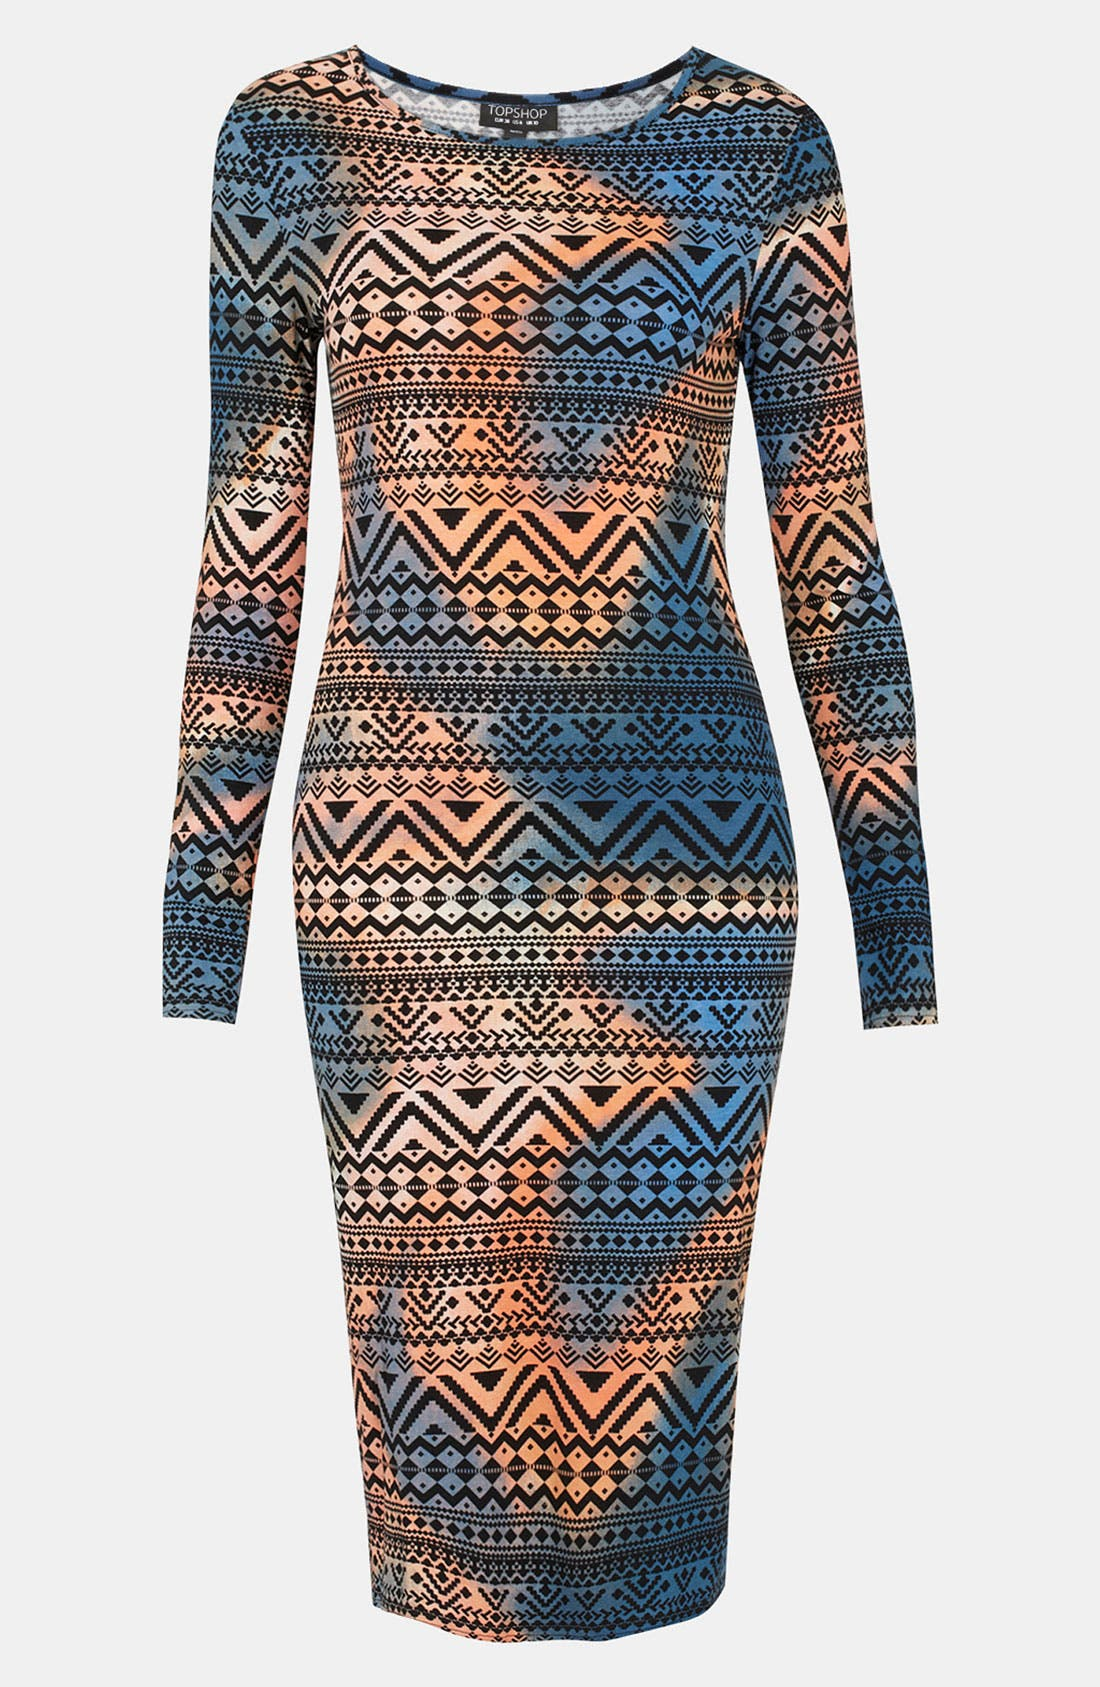 Main Image - Topshop Tie Dyed Aztec Print Body-Con Dress